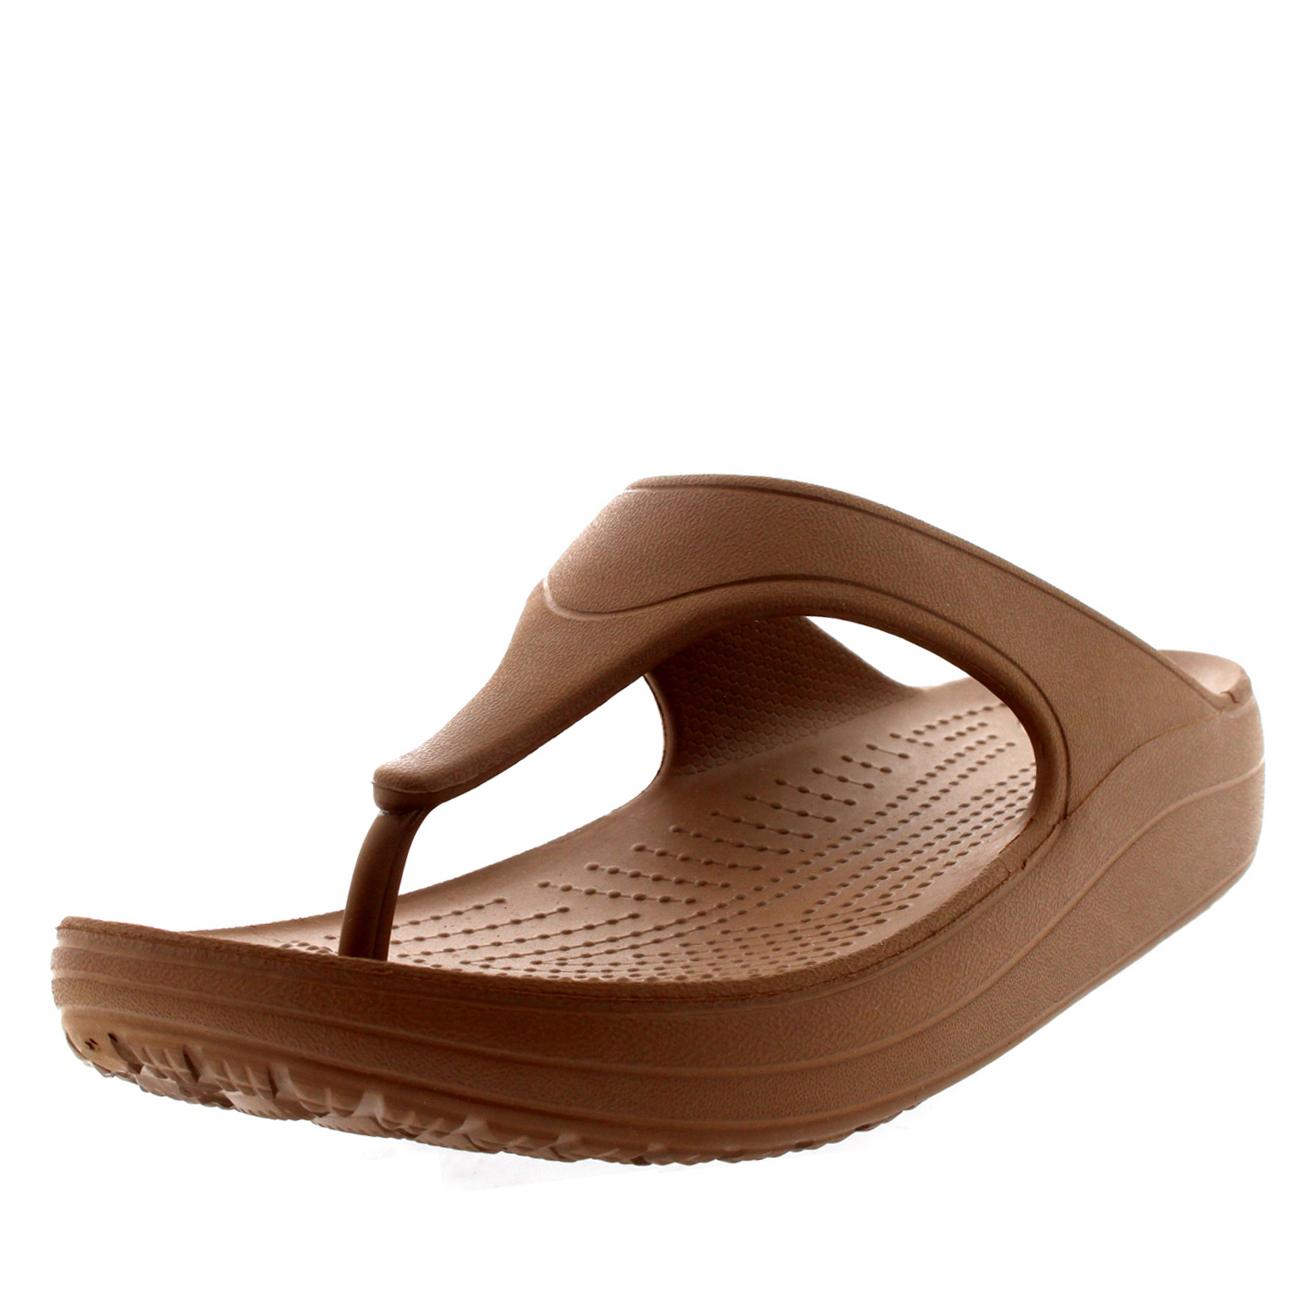 womens crocs sloane platform flip sandals beach. Black Bedroom Furniture Sets. Home Design Ideas